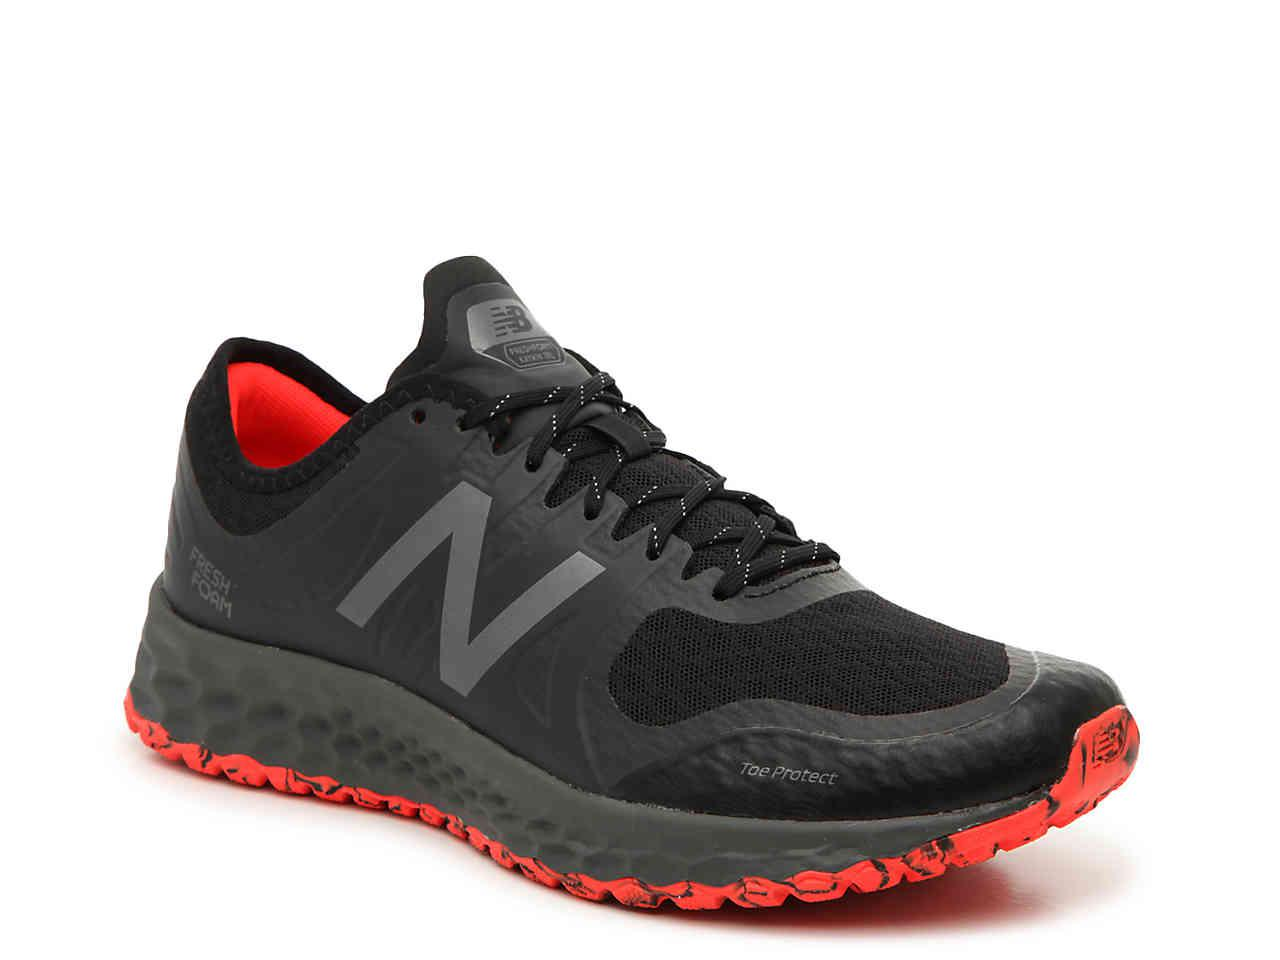 98561aaec8a Lyst - New Balance Fresh Foam Kaymin Trail Running Shoe in Black for Men